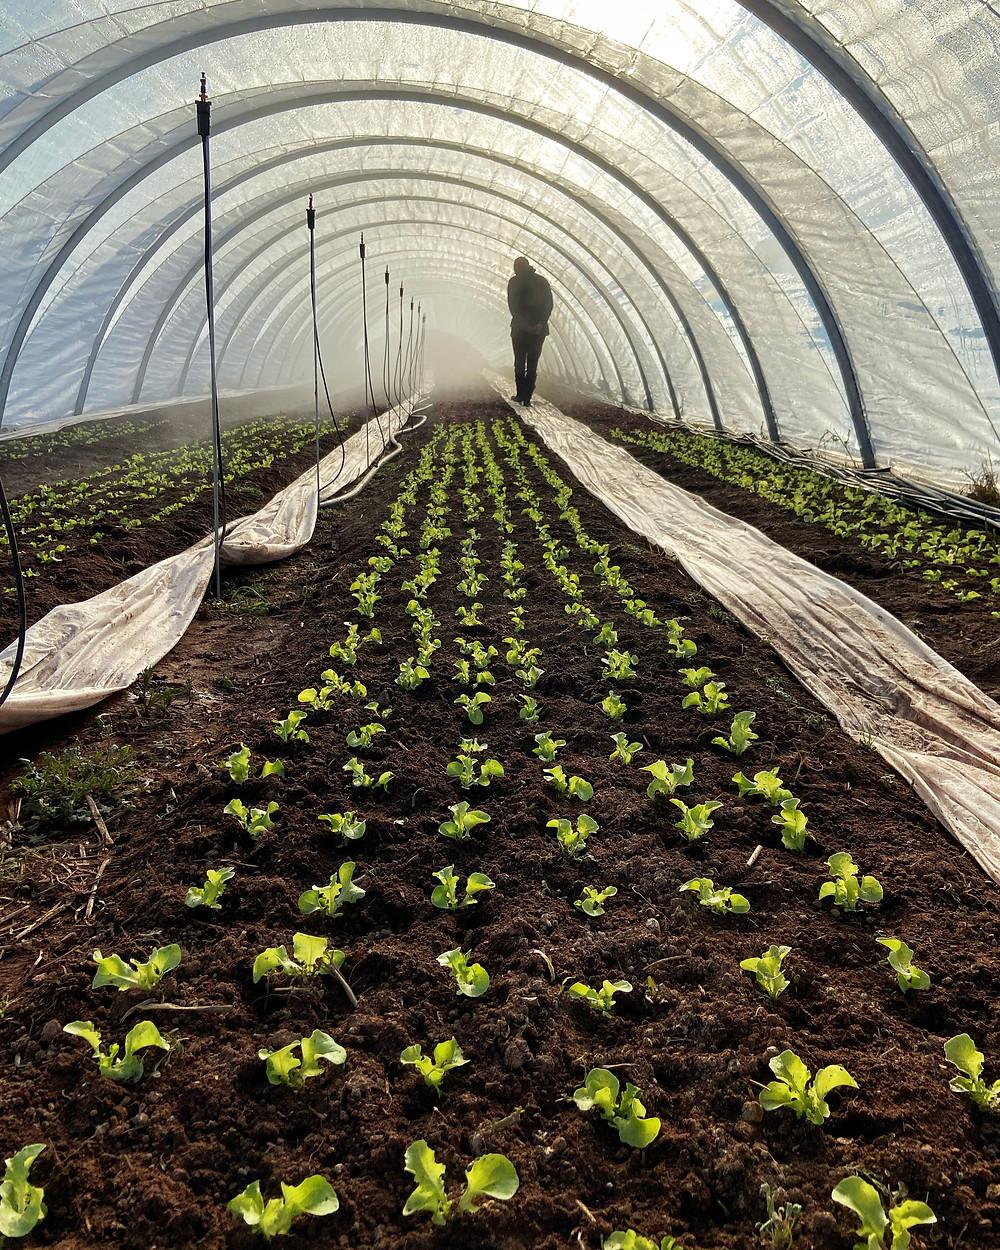 organic vegetable farm pei greenhouse lettuce spring